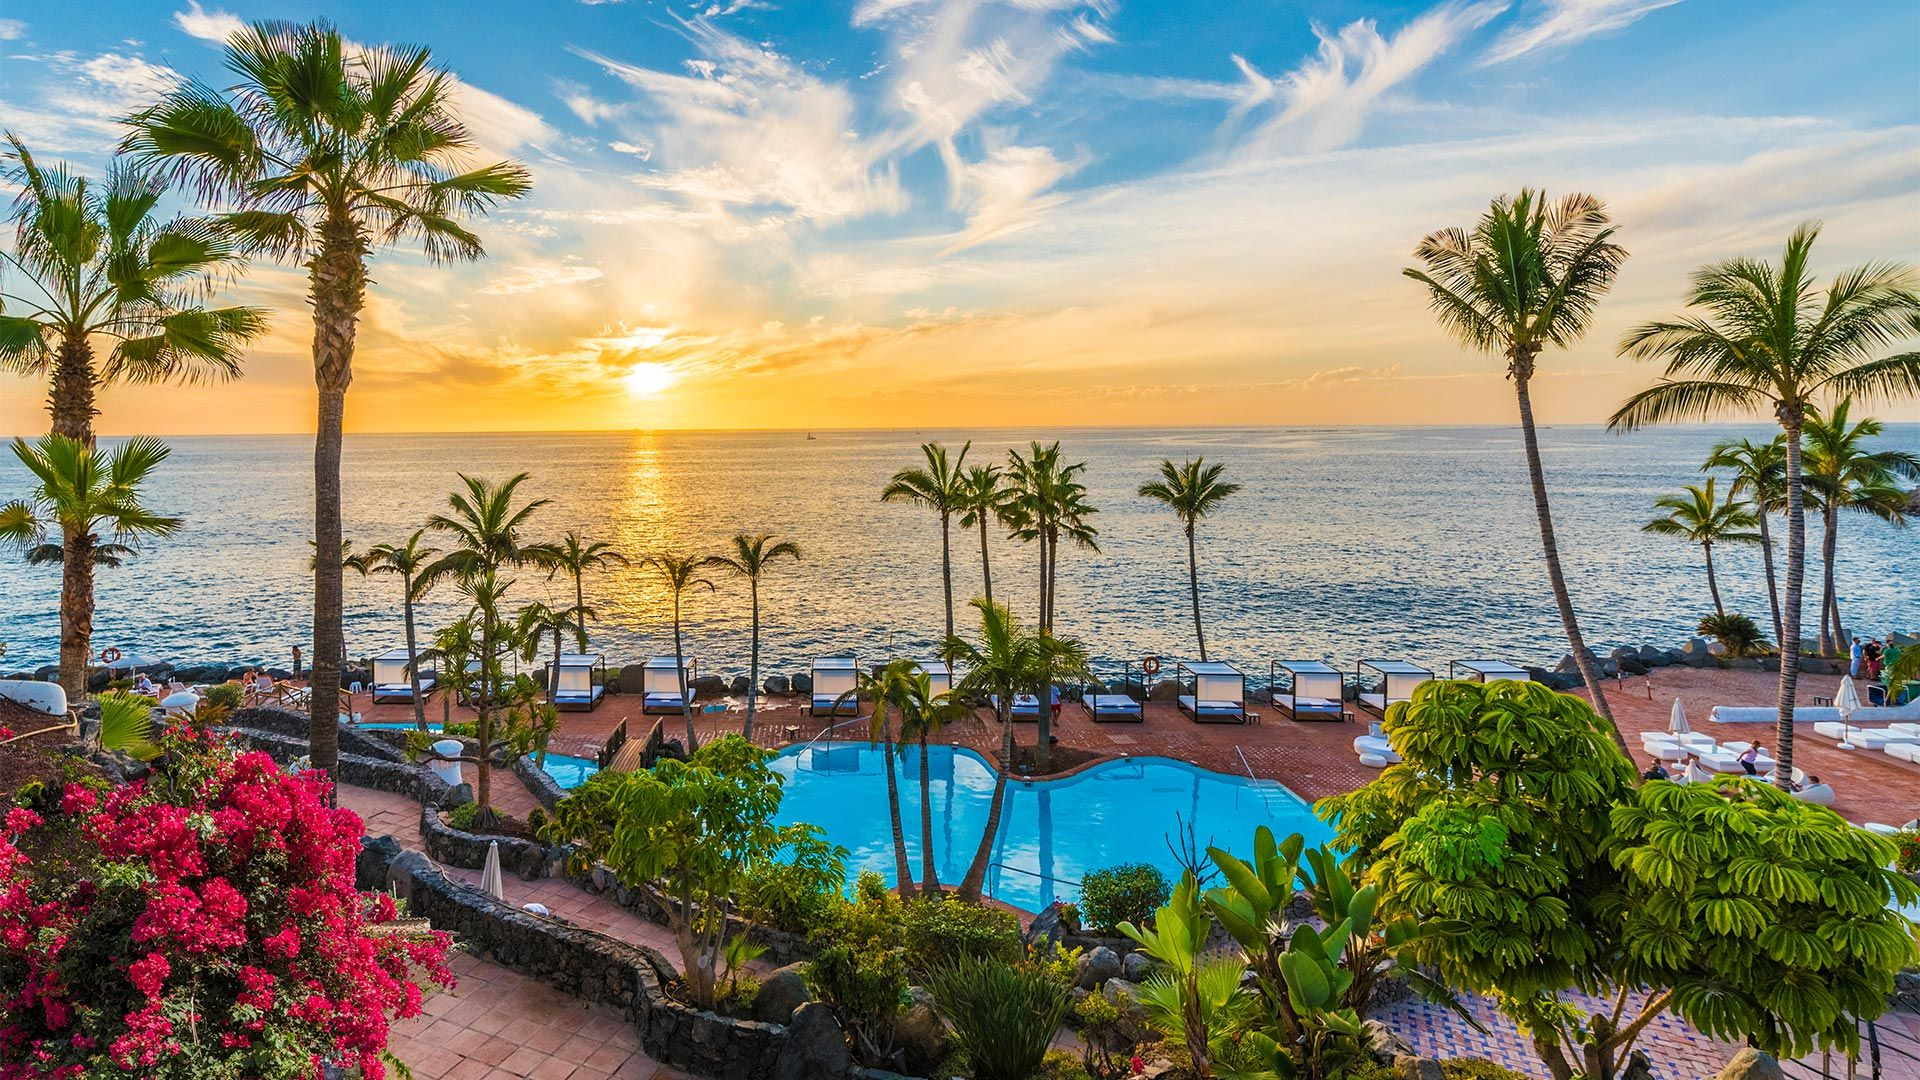 Sejur plaja Tenerife, 9 zile - iulie 2021